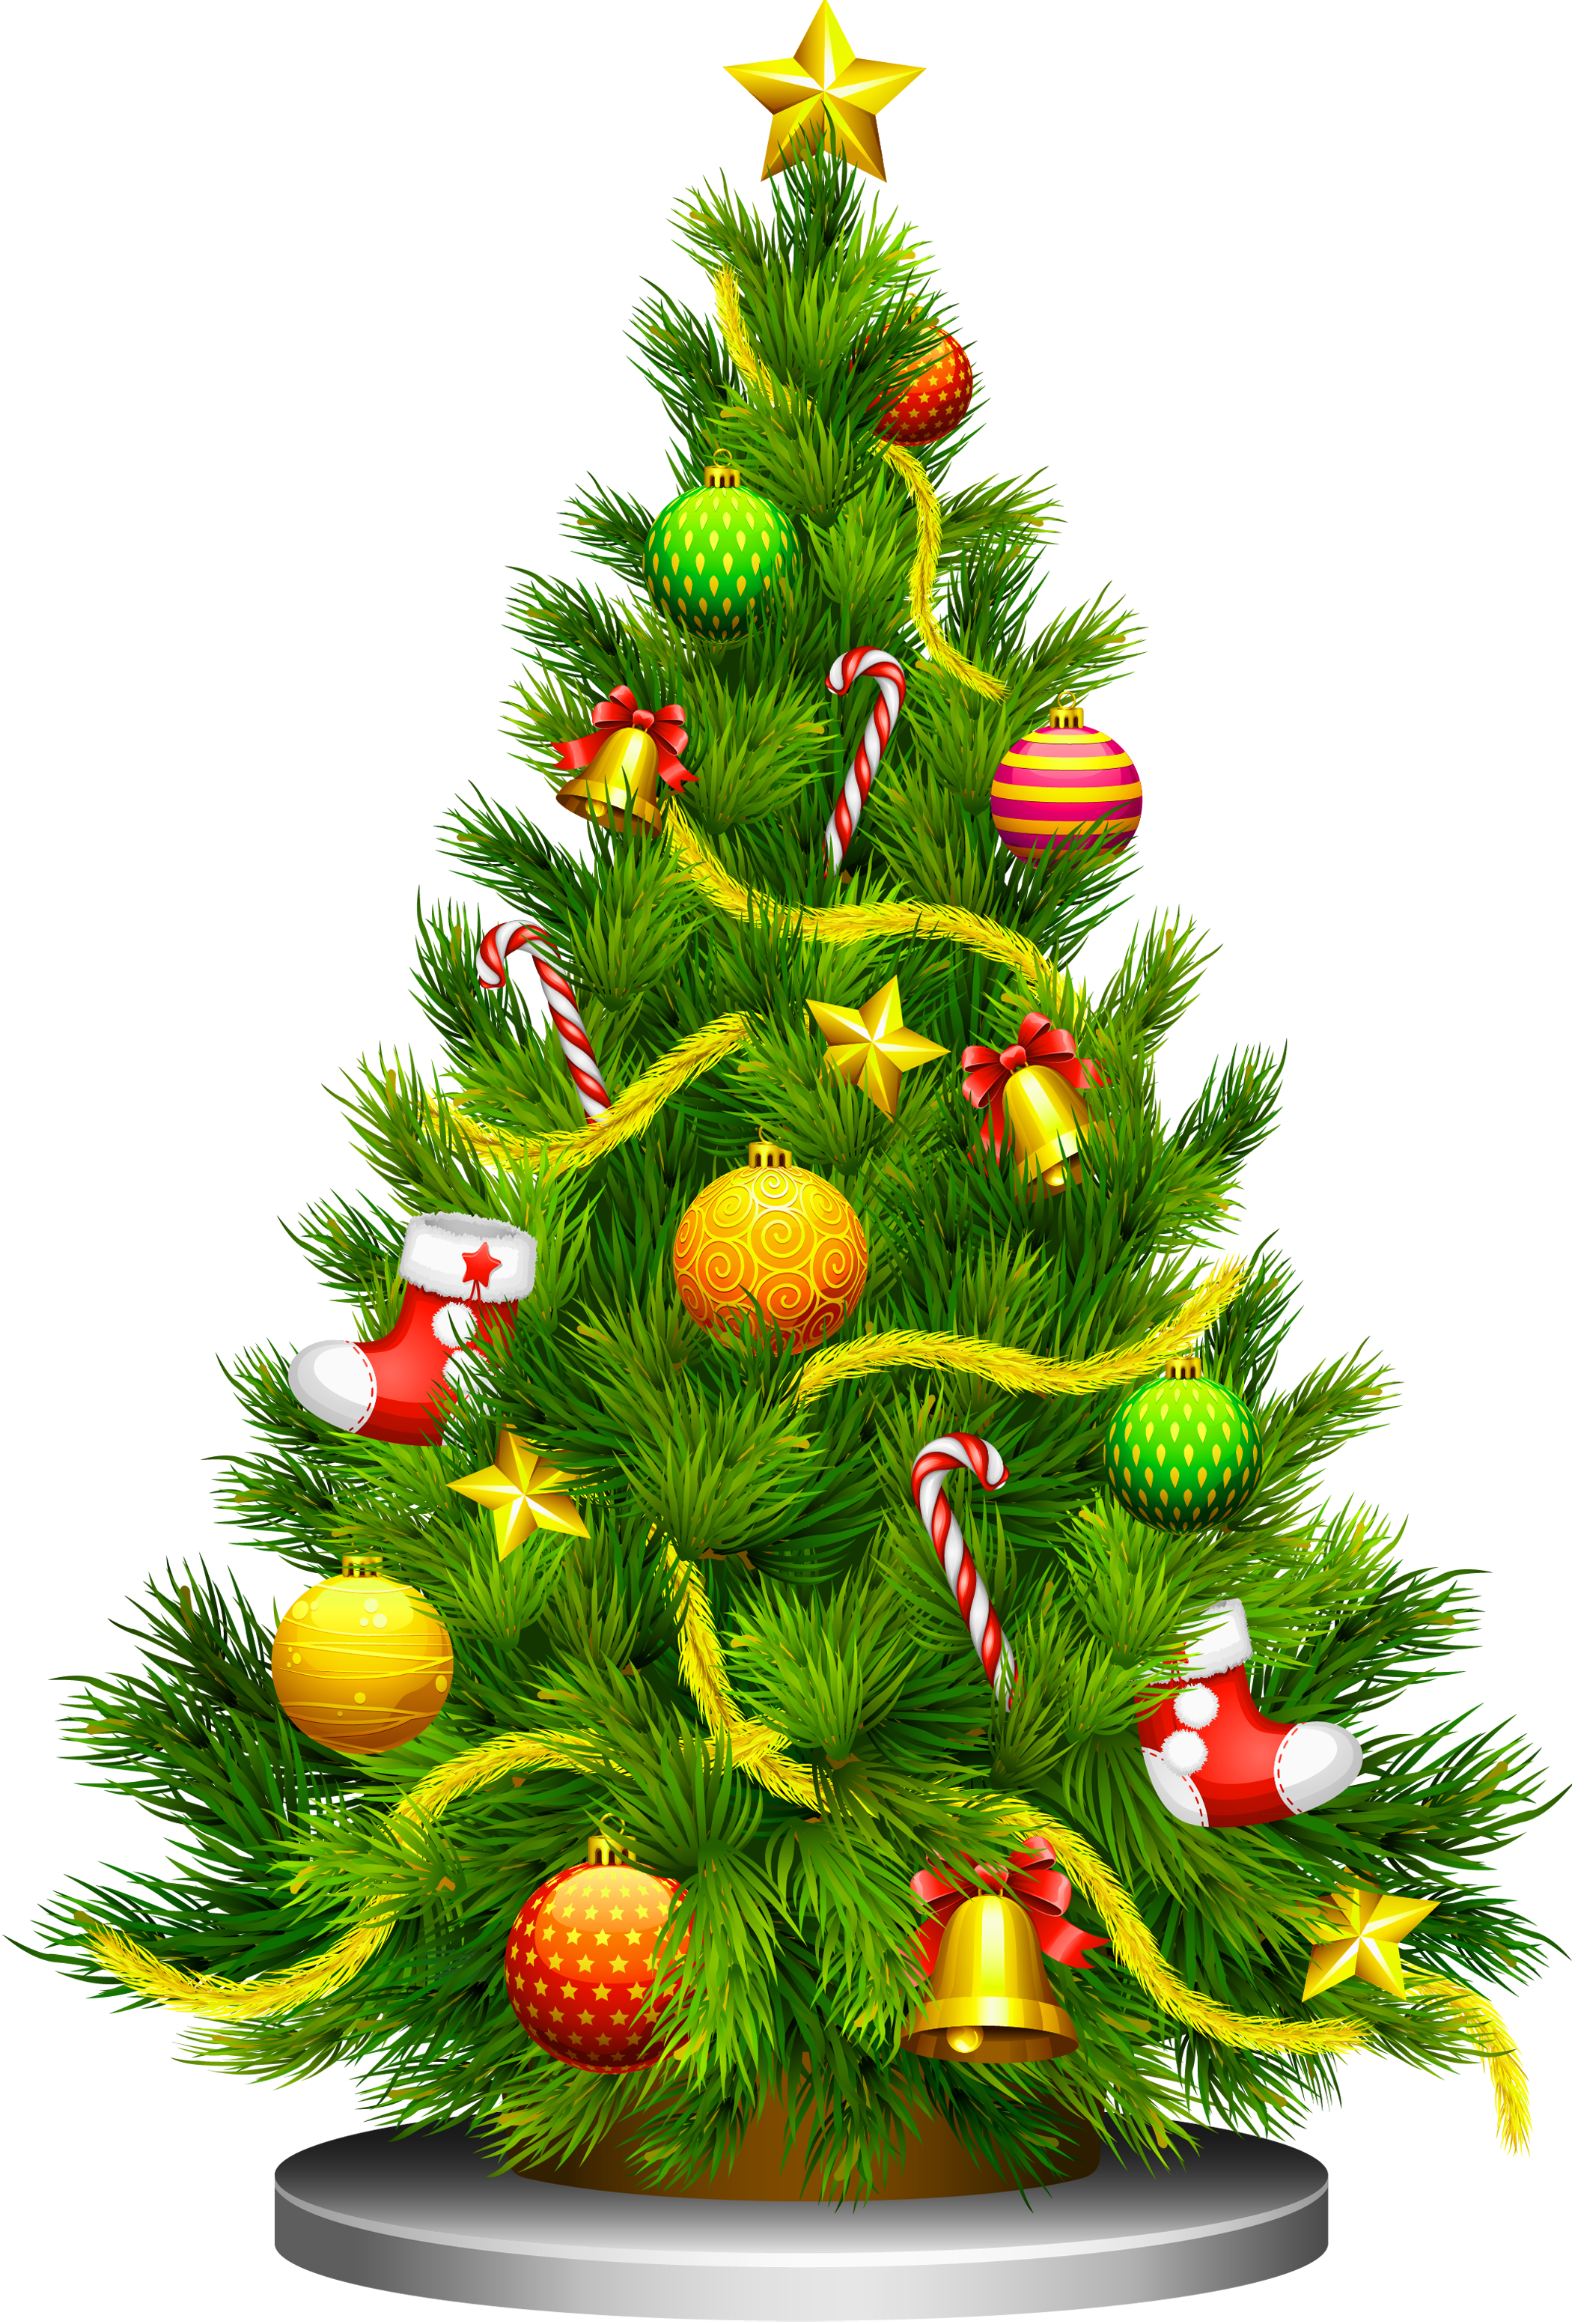 Christmas Tree Clip Art Transparent Christmas Christmas Tree Clipart Christmas Tree With Presents Christmas Tree Images